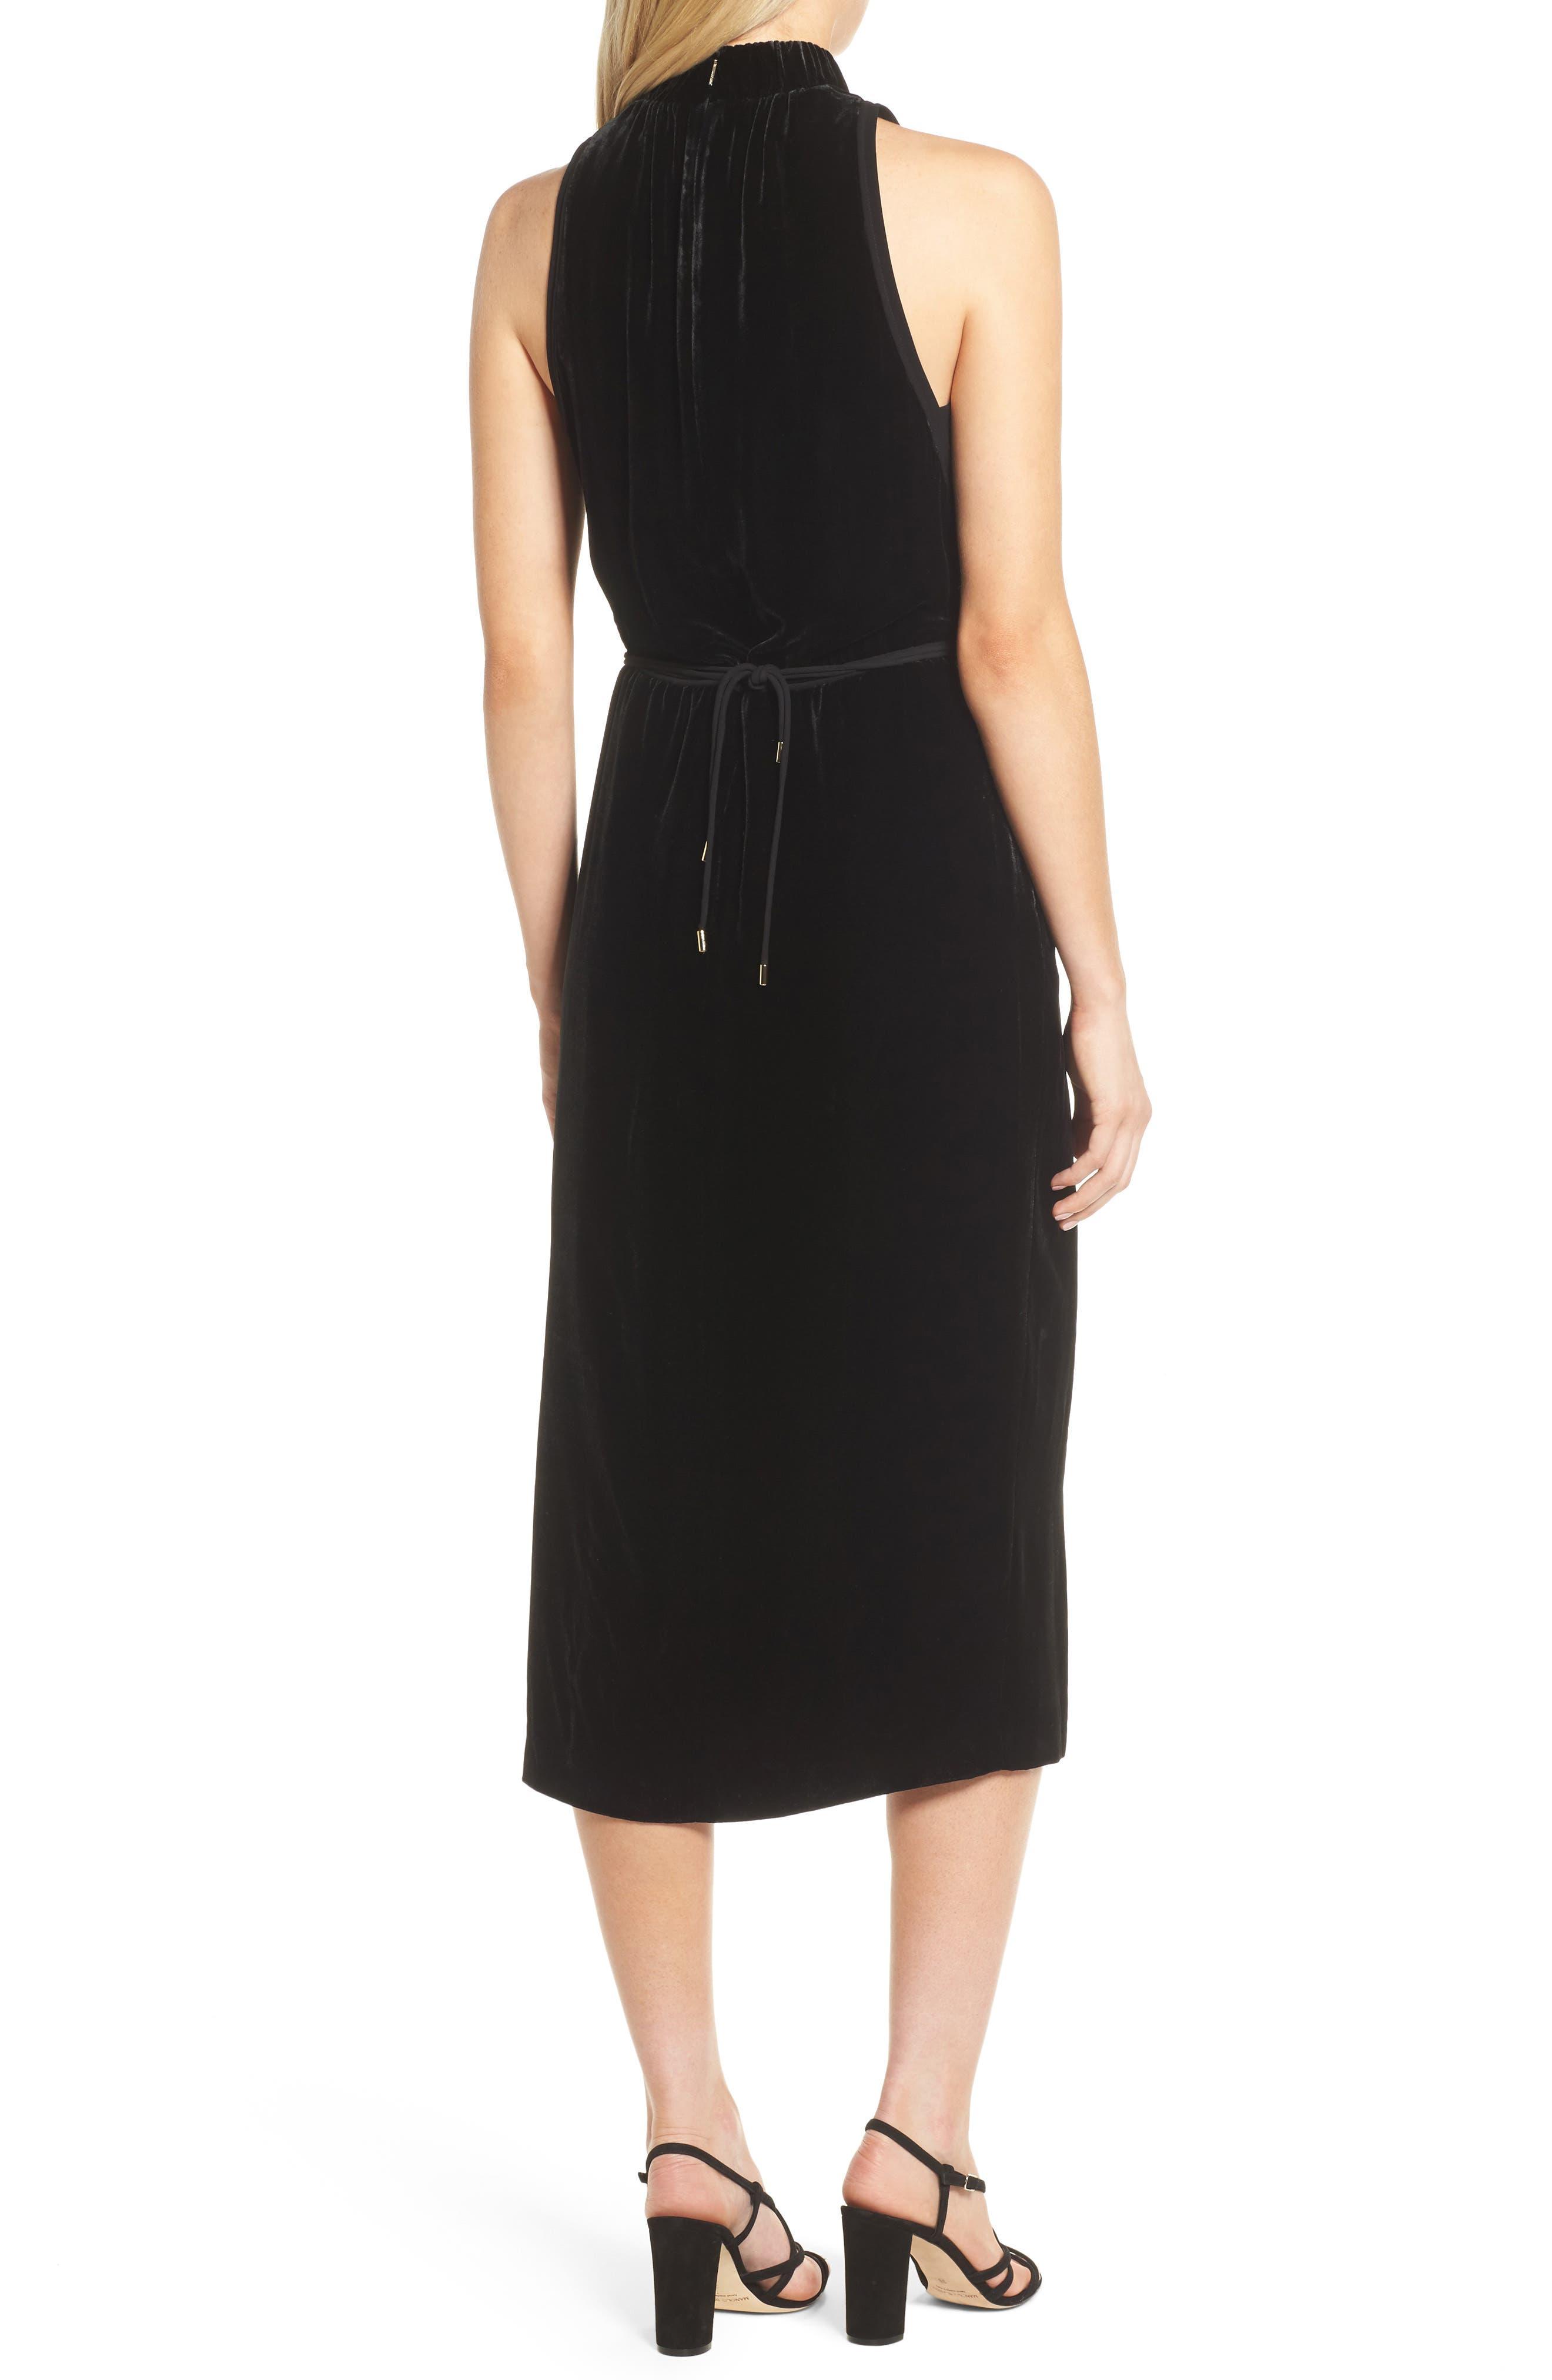 Difosia Velvet Midi Dress,                             Alternate thumbnail 2, color,                             Black